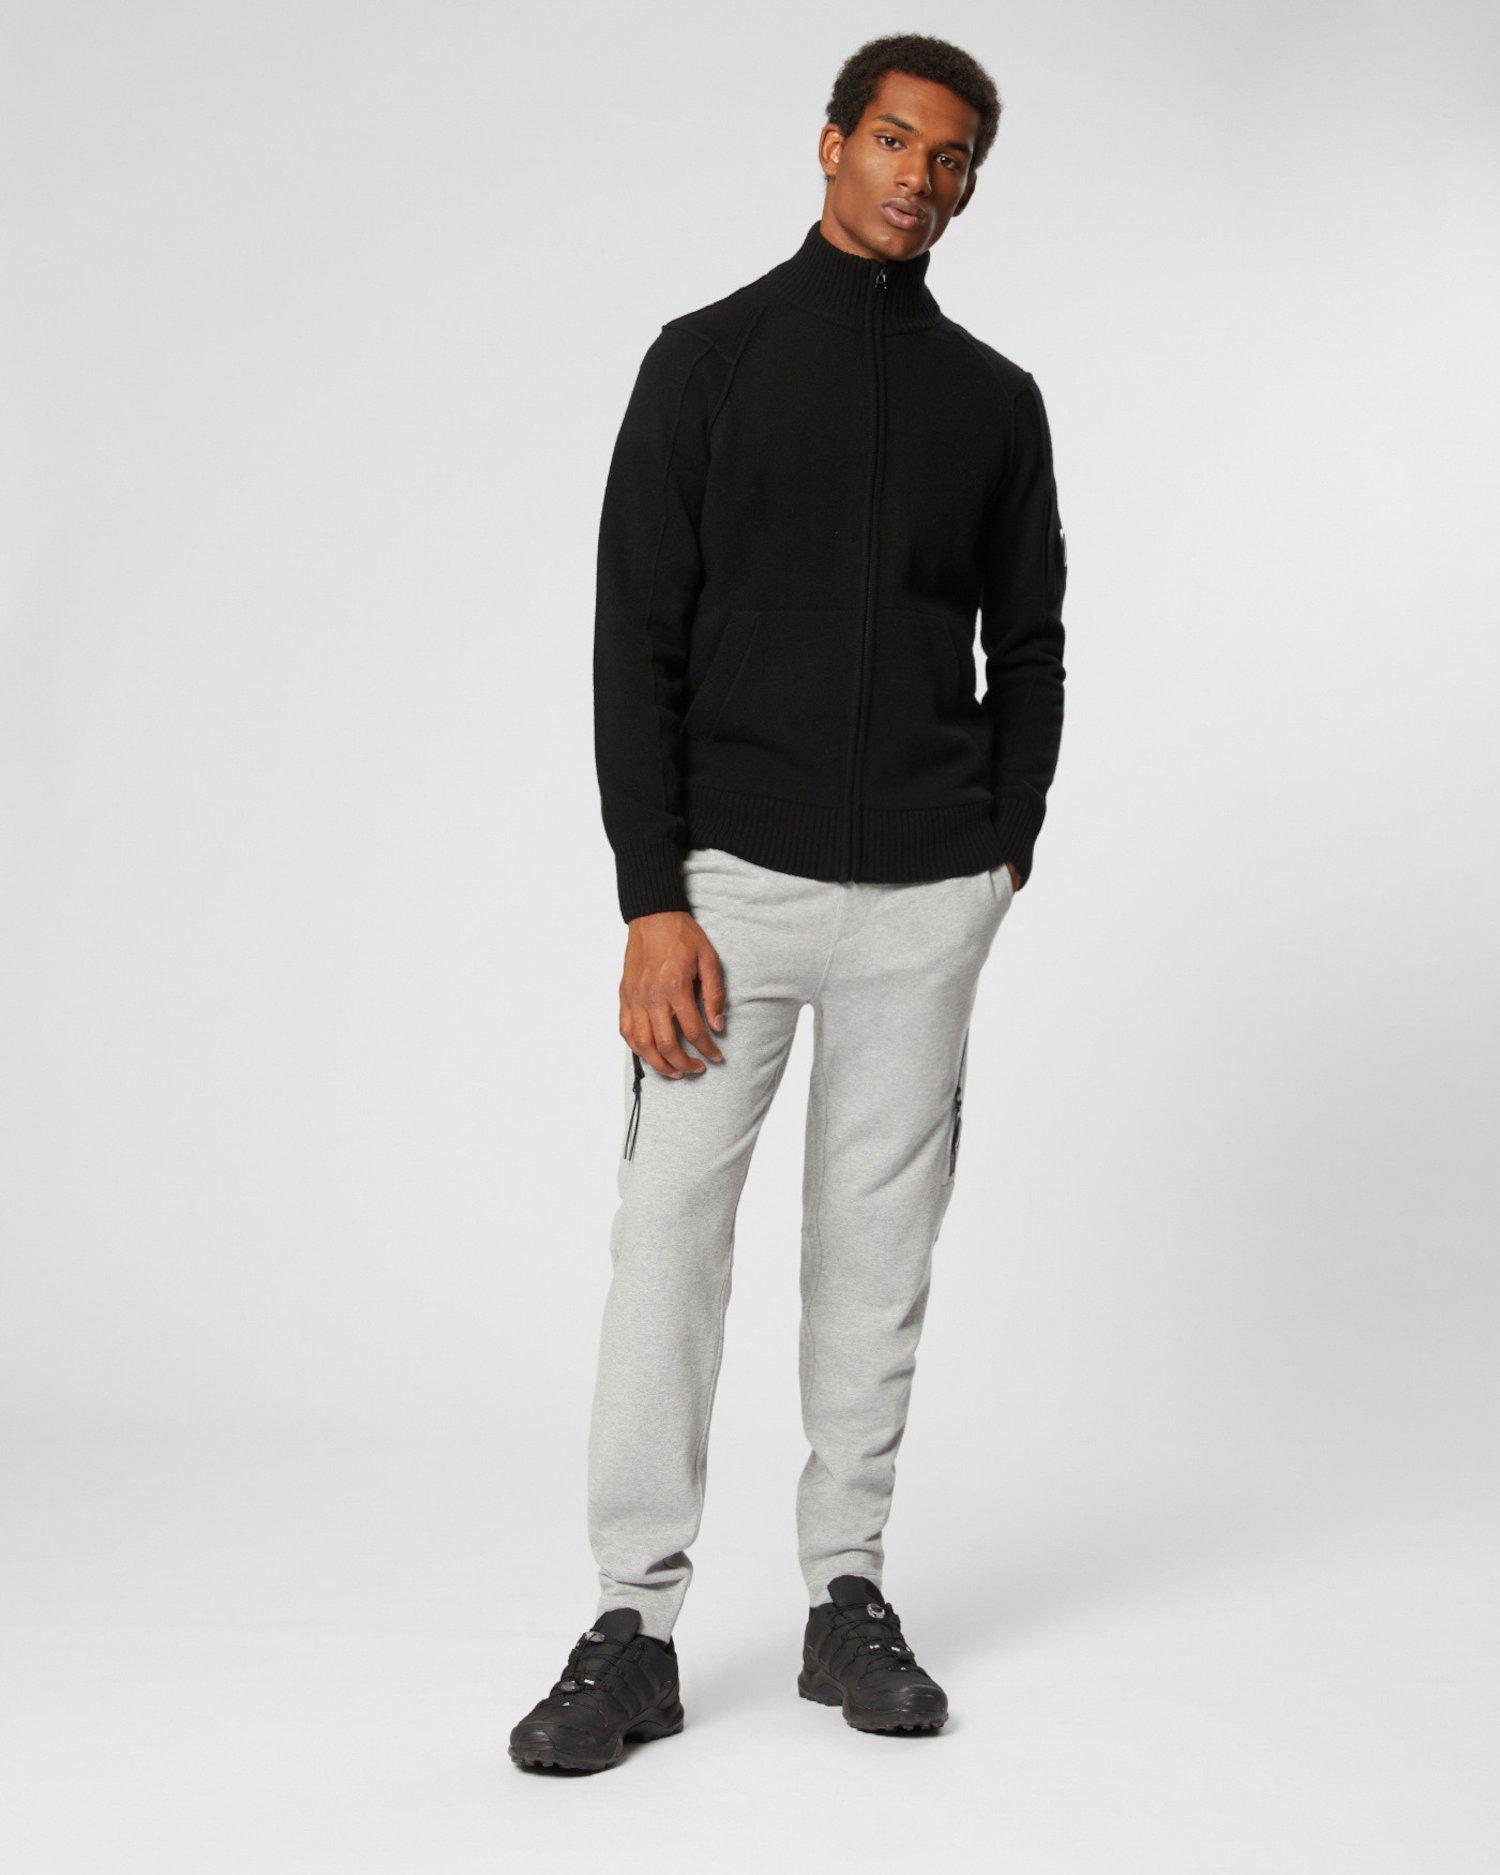 Lambswool Full Zip Sweater